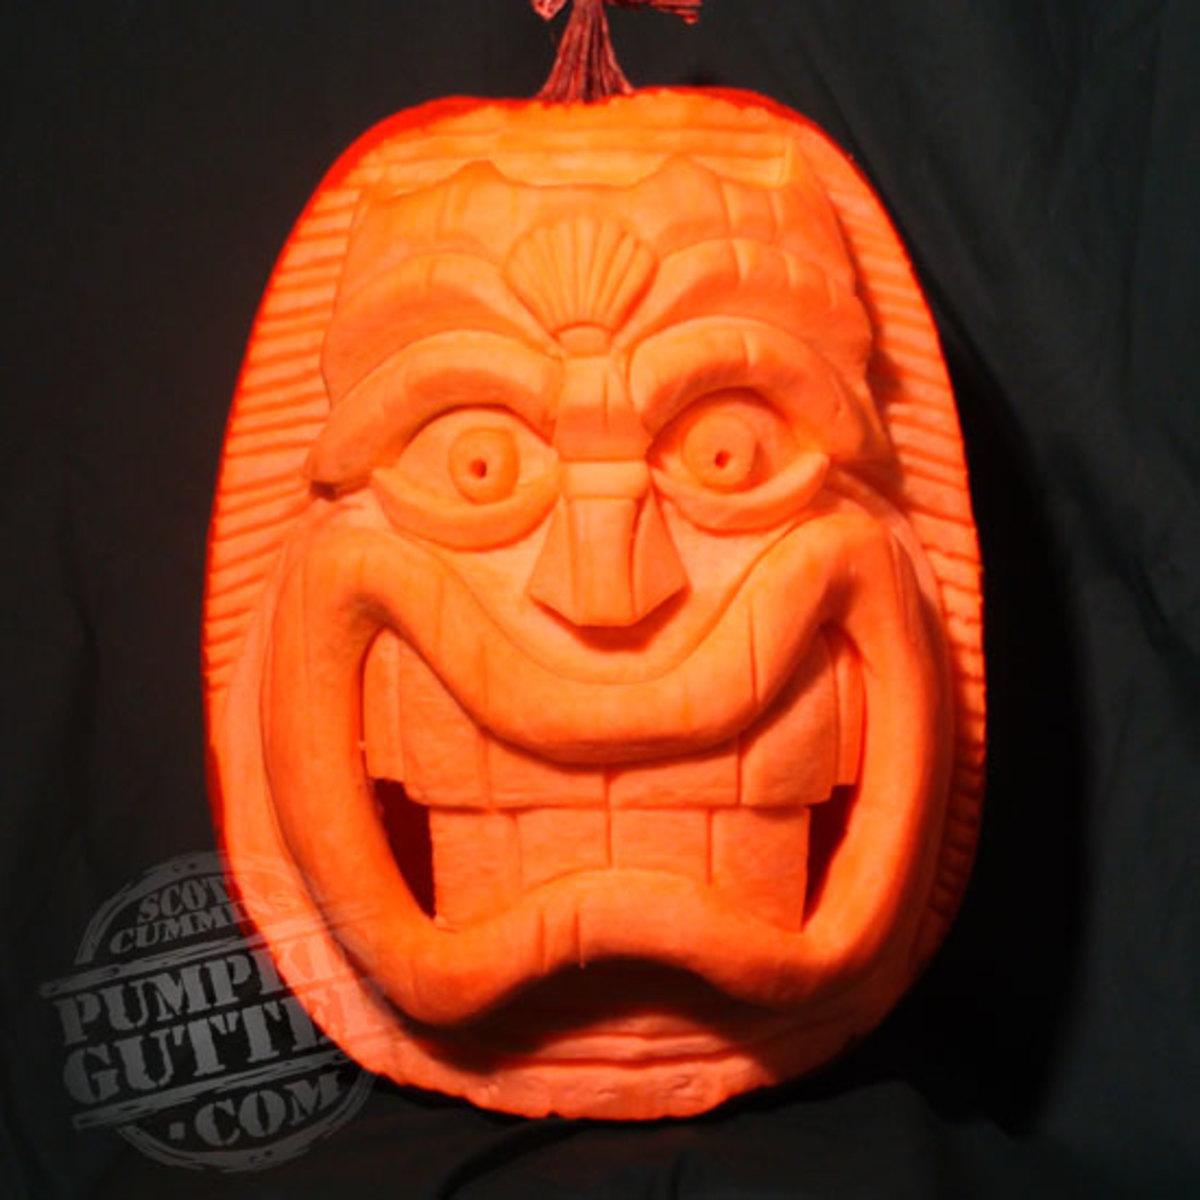 Tiki totem pole pumpkin